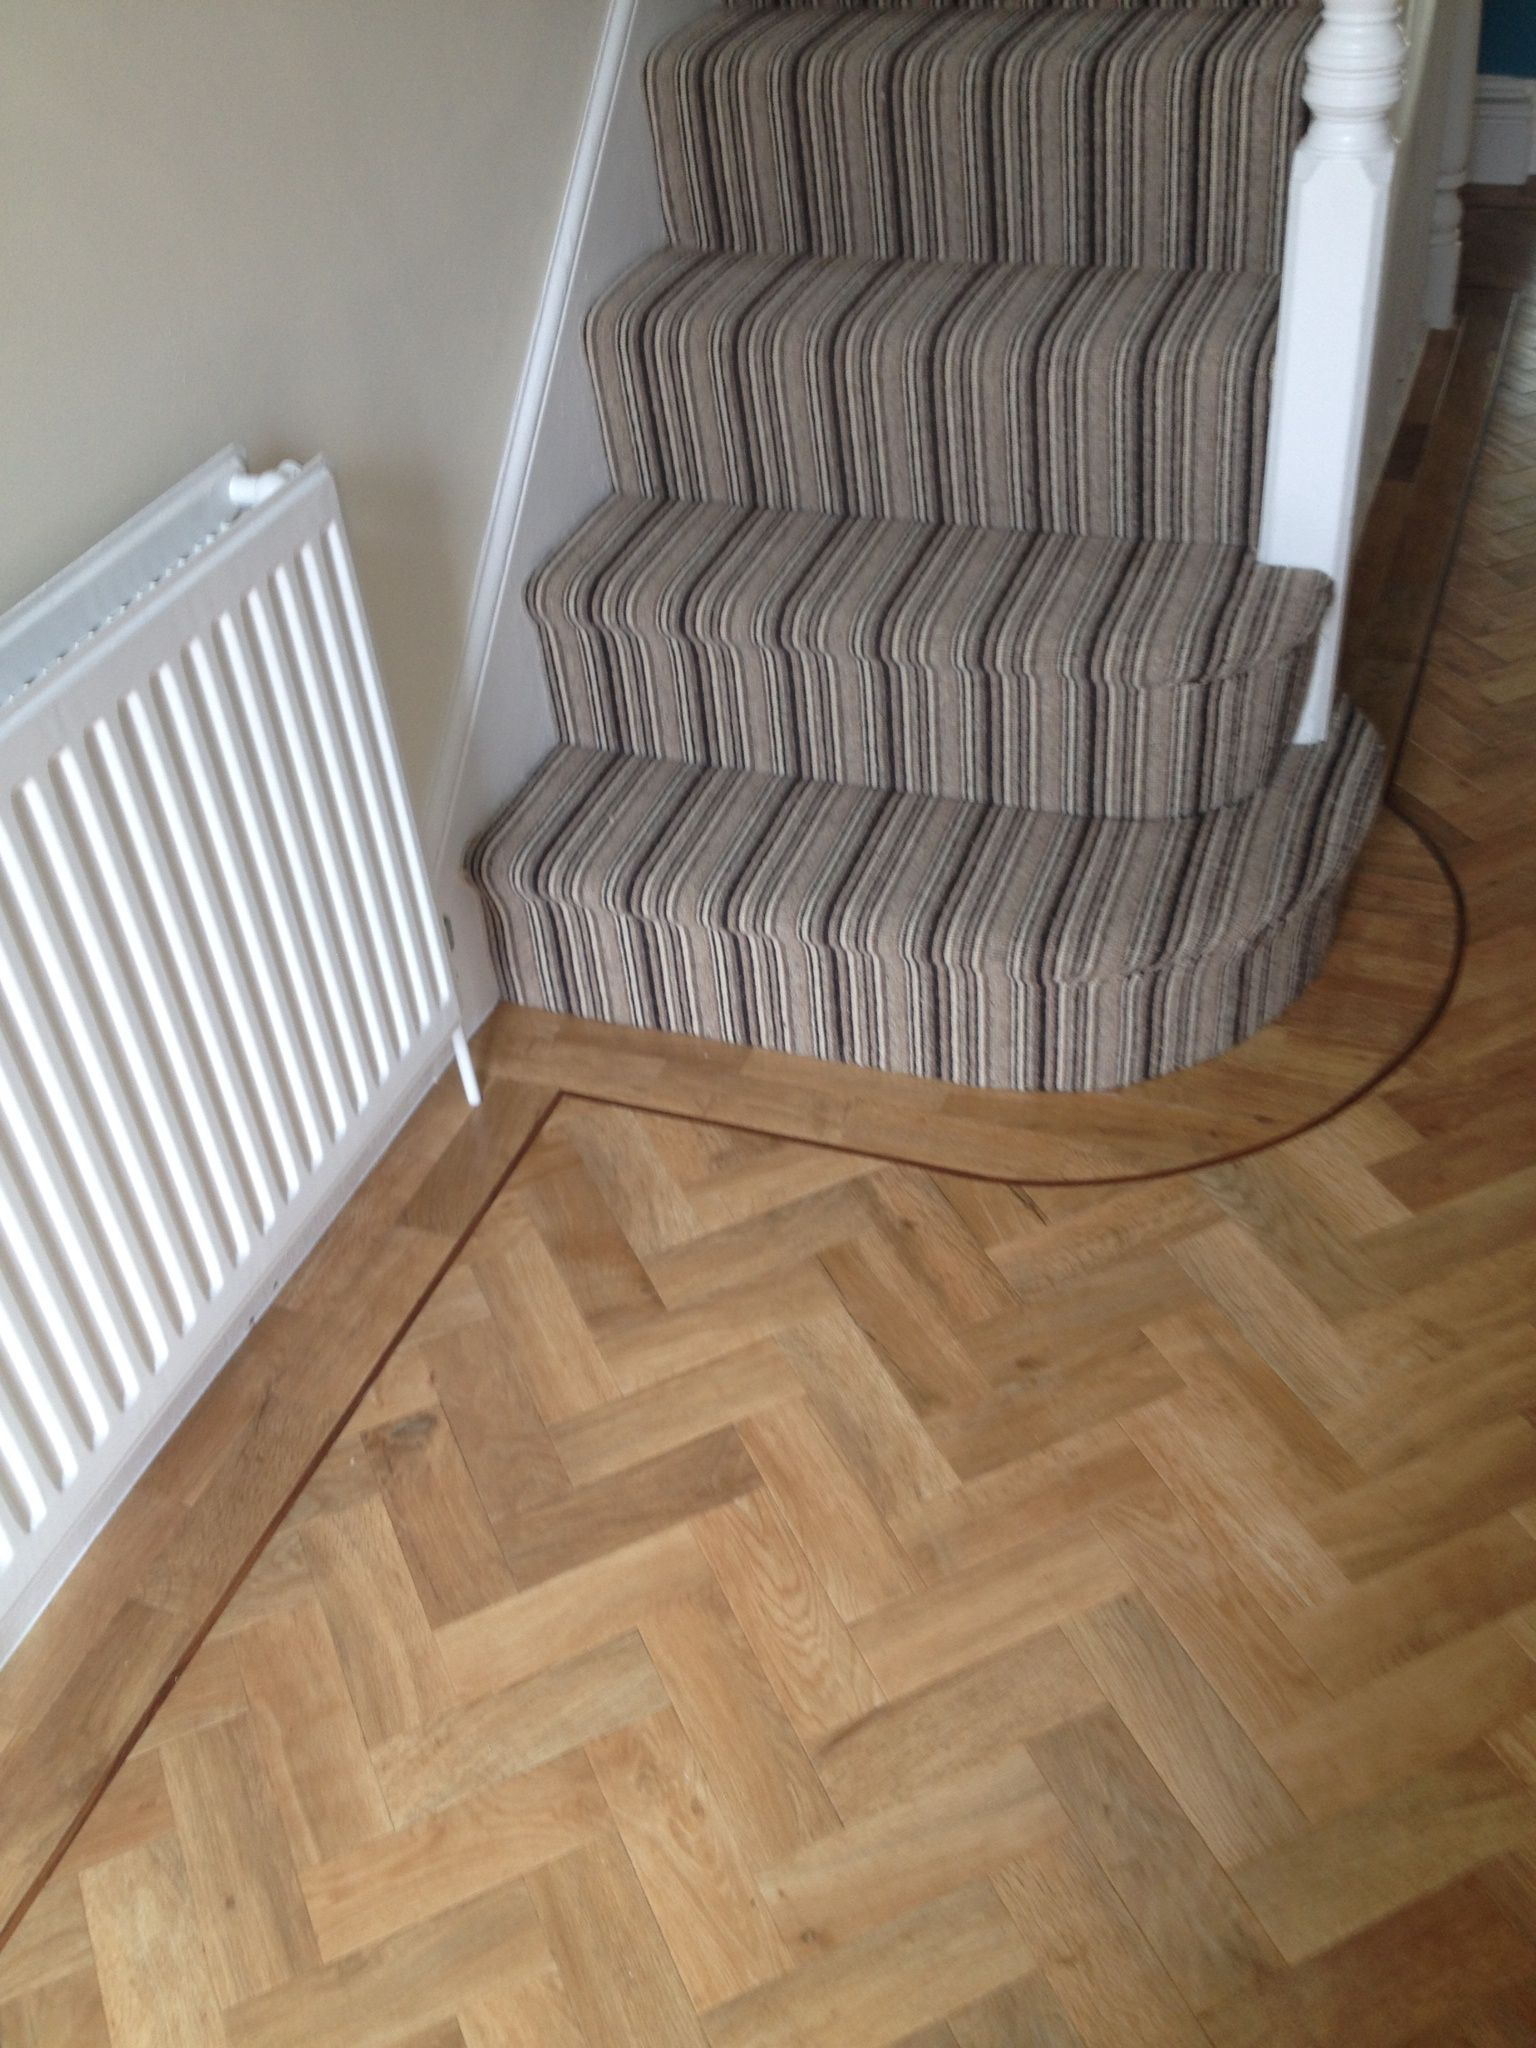 Art Select Blonde Oak Parquet Flooring Hallway Flooring